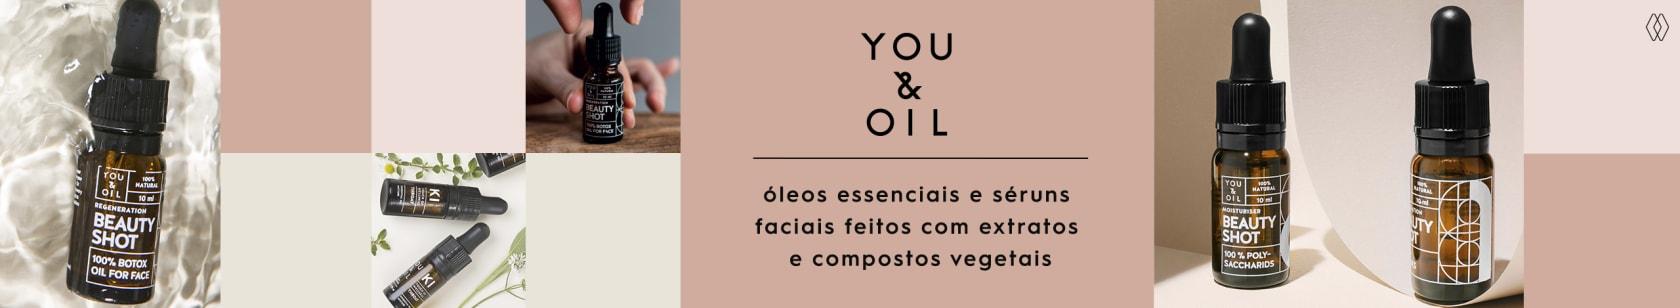 YOU & OIL   AMARO